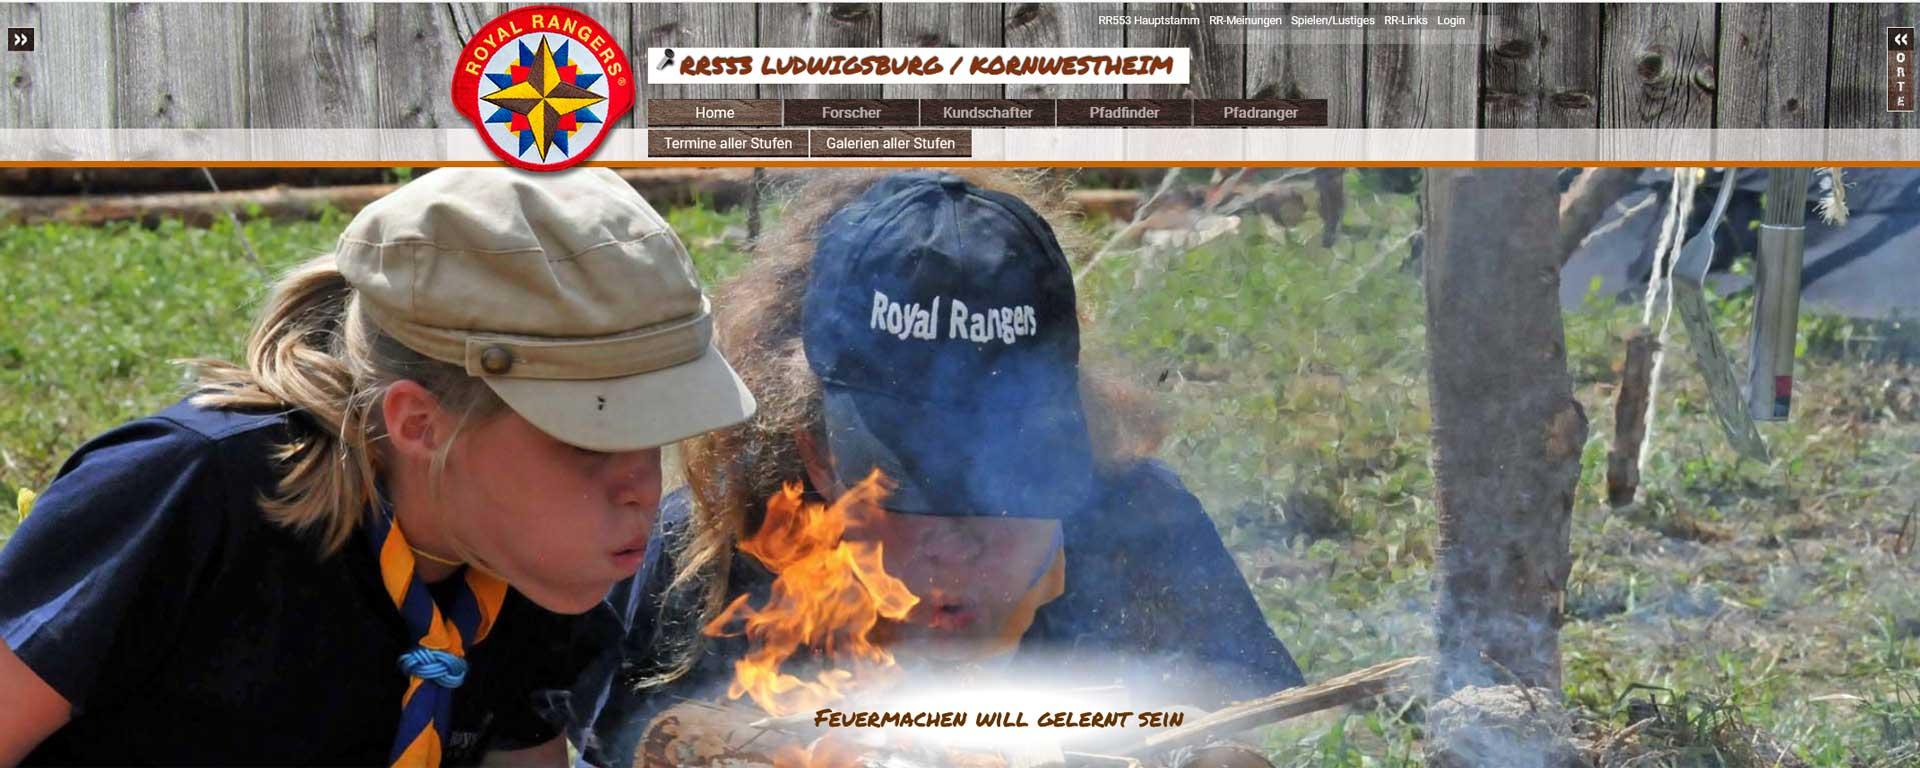 Pfadfinder Royal Rangers Ludwigsburg